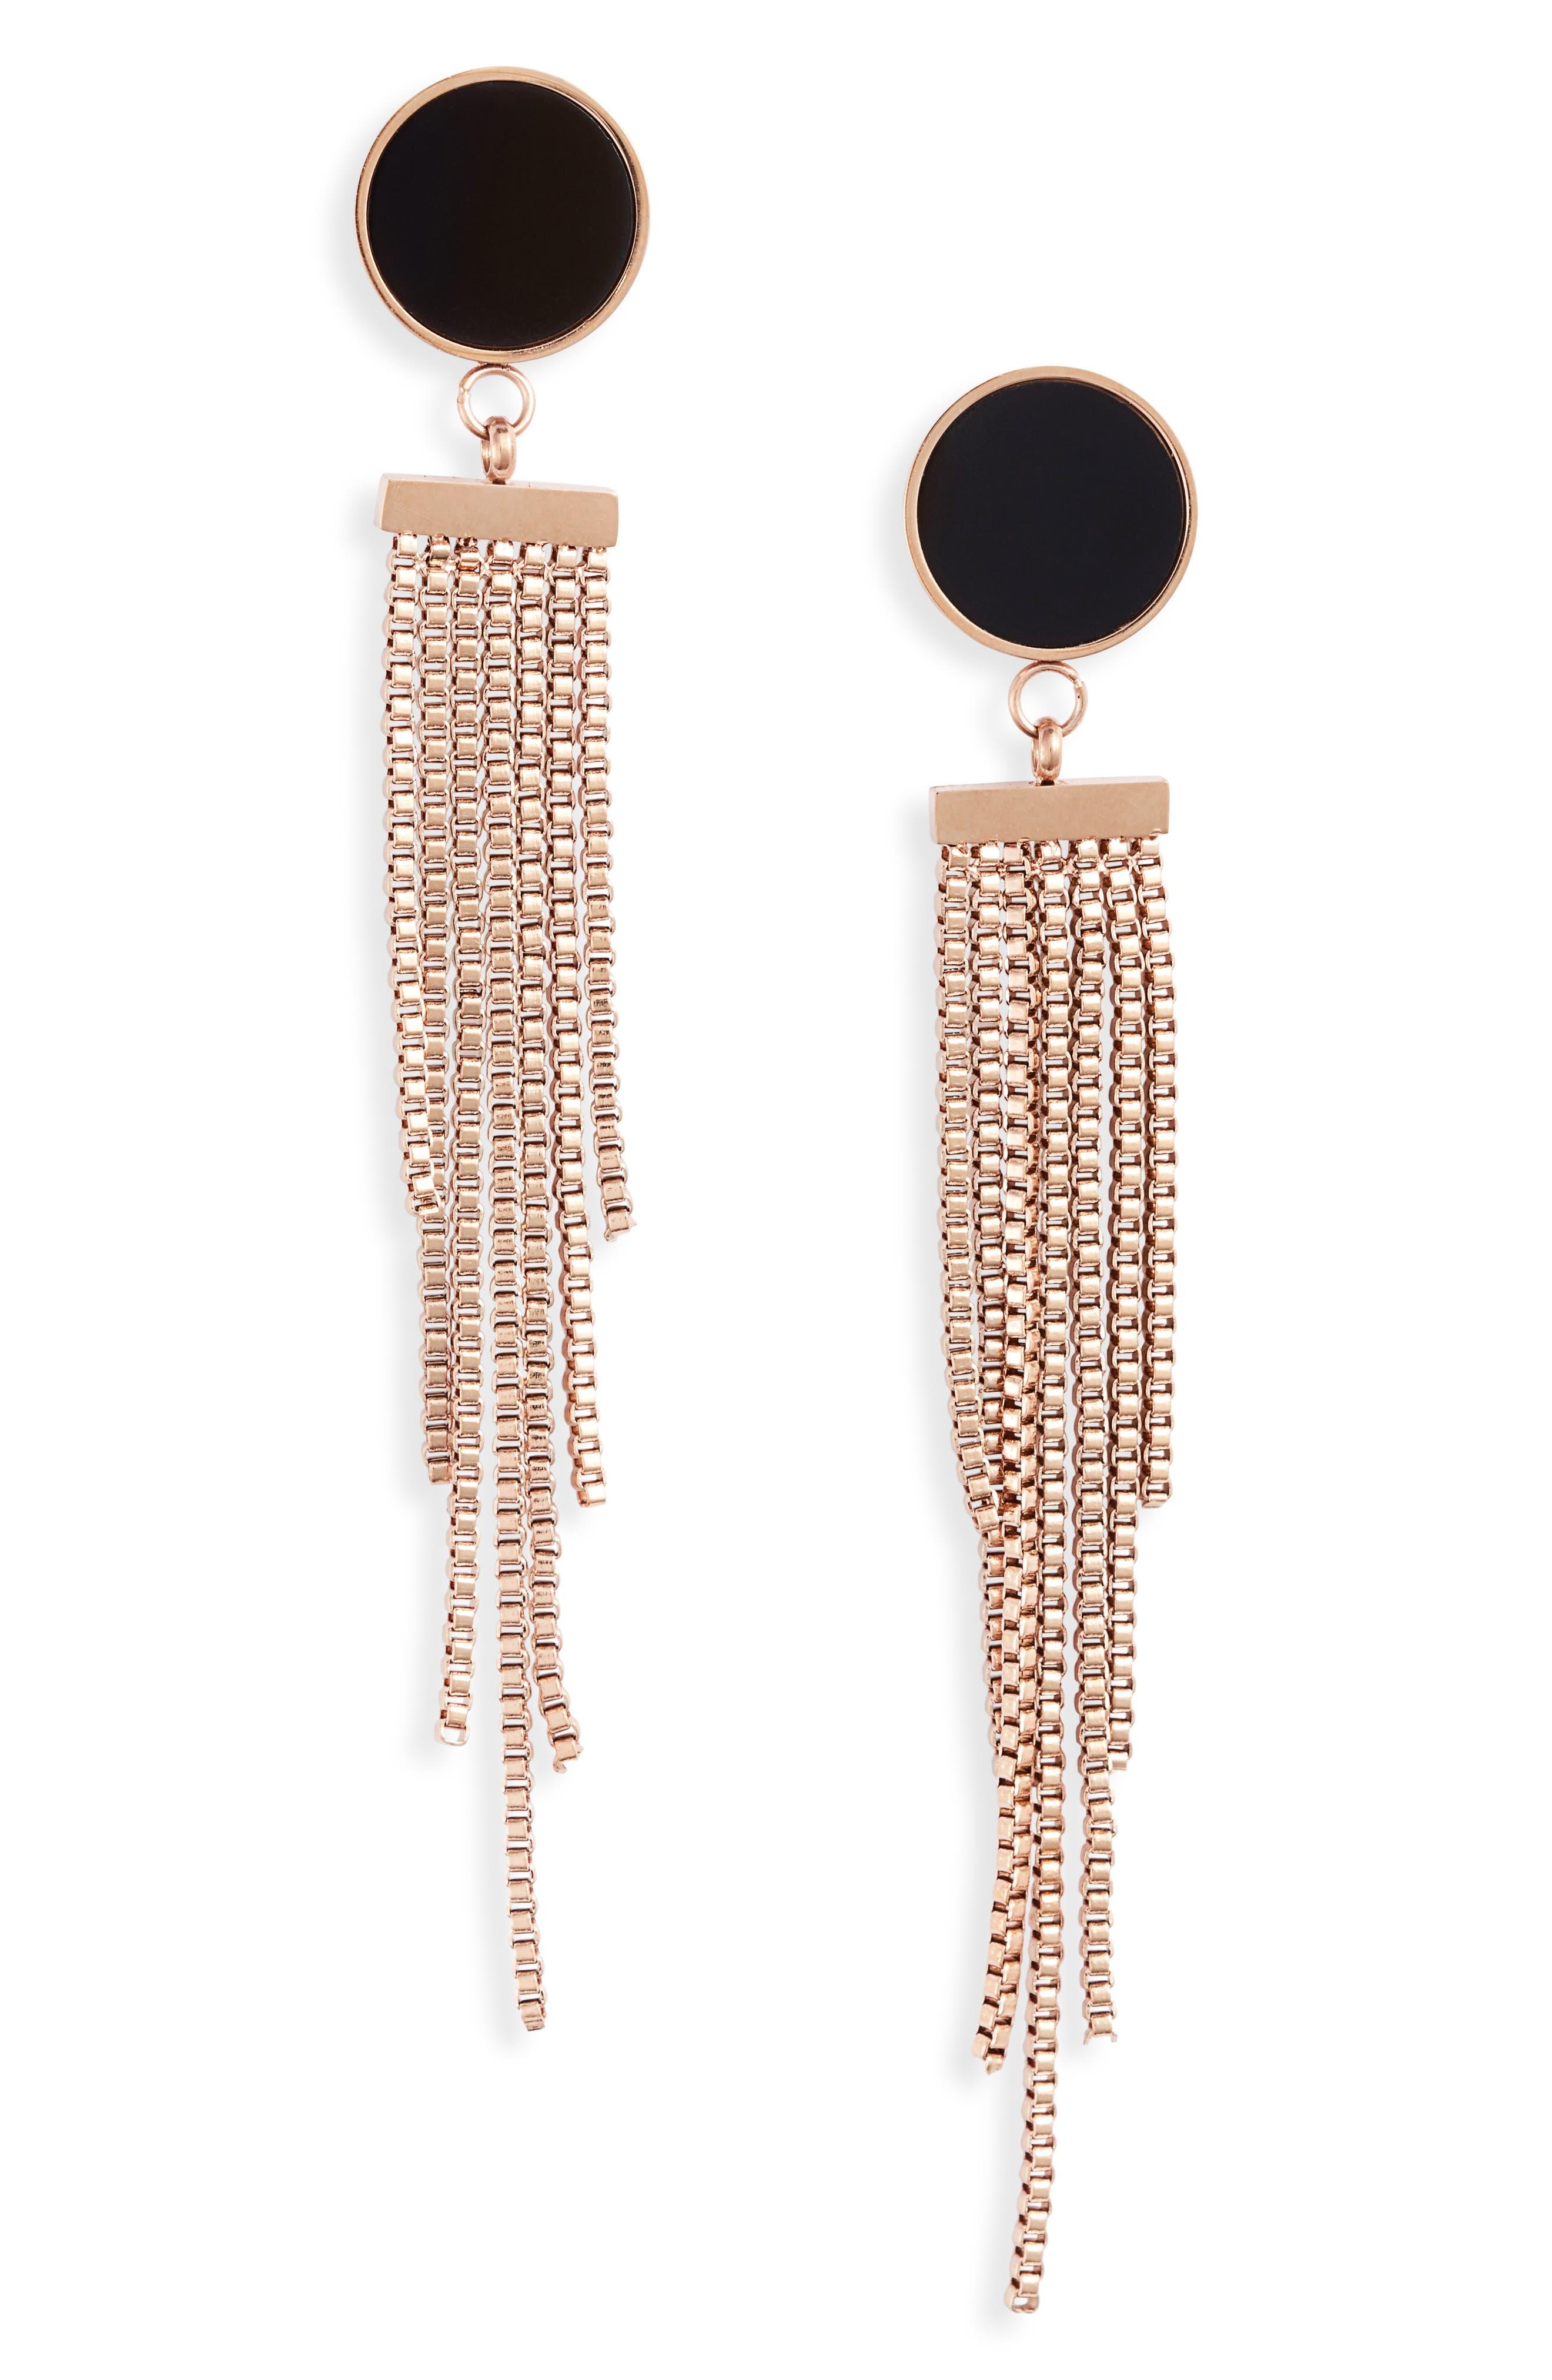 Deco Chain Tiered Drop Earrings